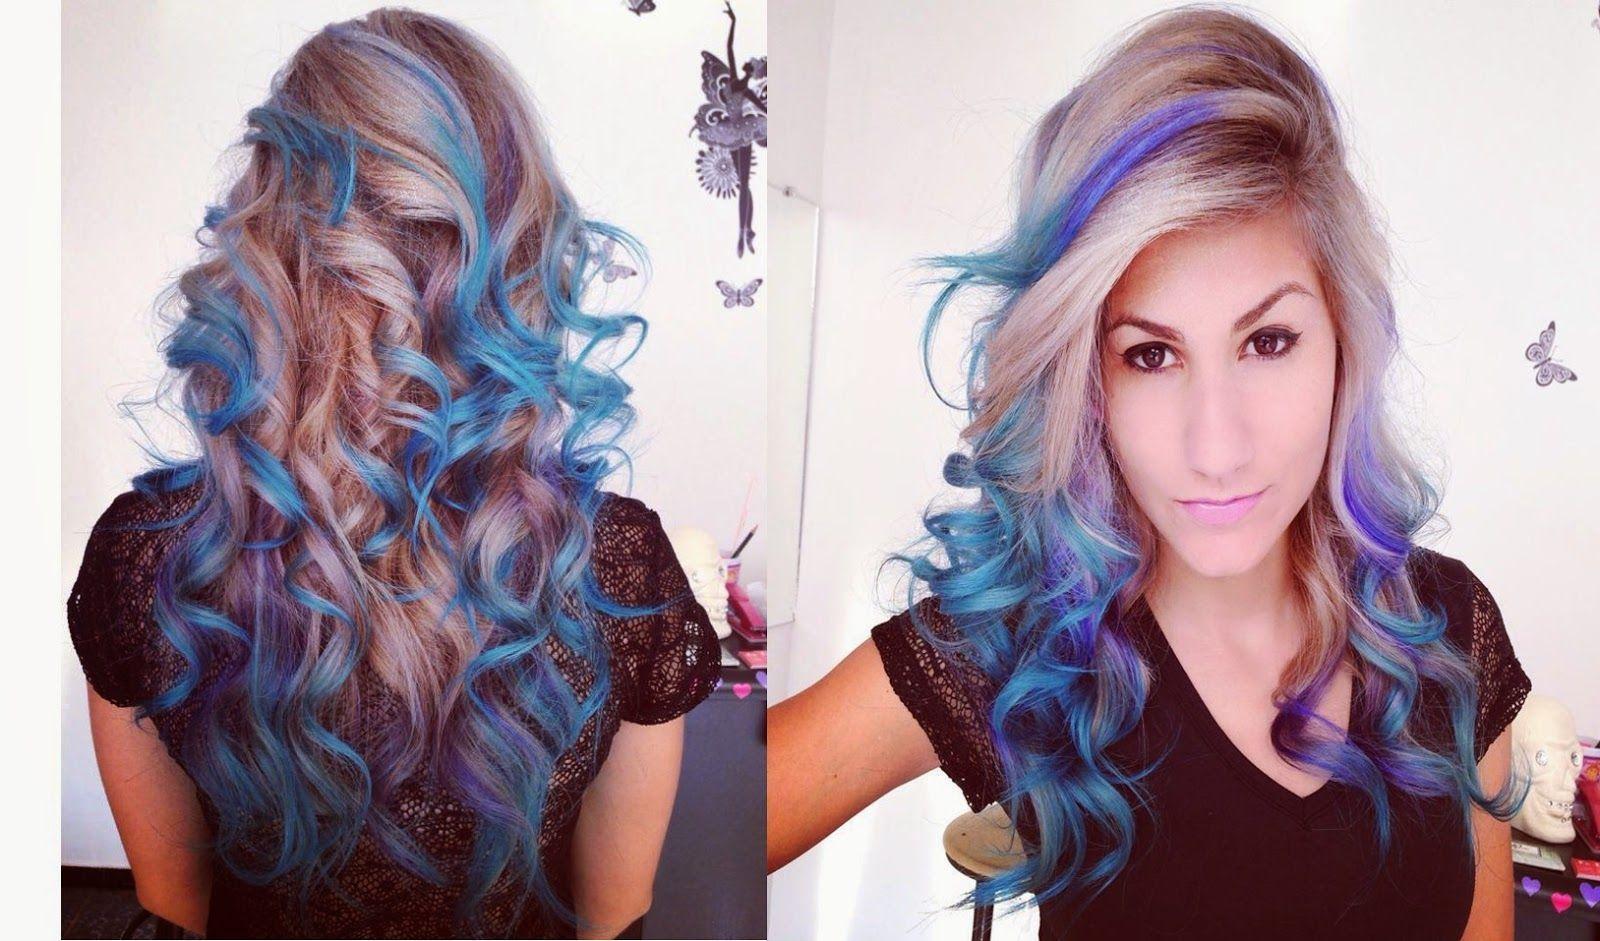 "Foto: Reprodução / <a href=""http://www.pamellarocha.com/2014/06/cabelo-colorido-pamella-rocha-azul-2.html#.VOsowP7F-So"" target=""_blank"">Pamella Rocha</a>"